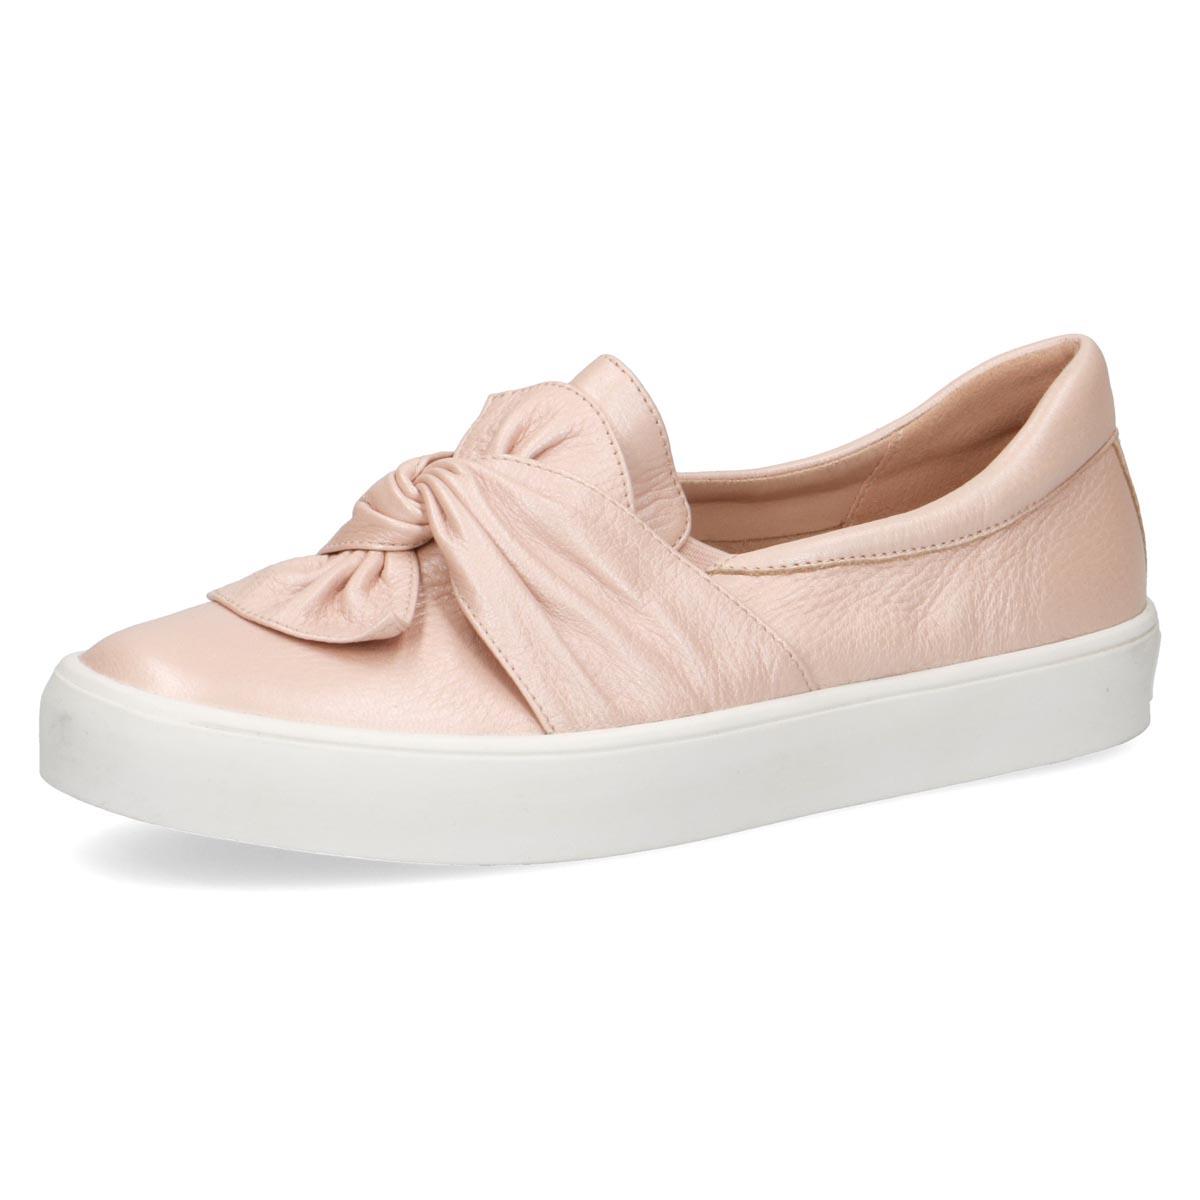 Cosi - Caprice Soft Rose Gold Sneaker